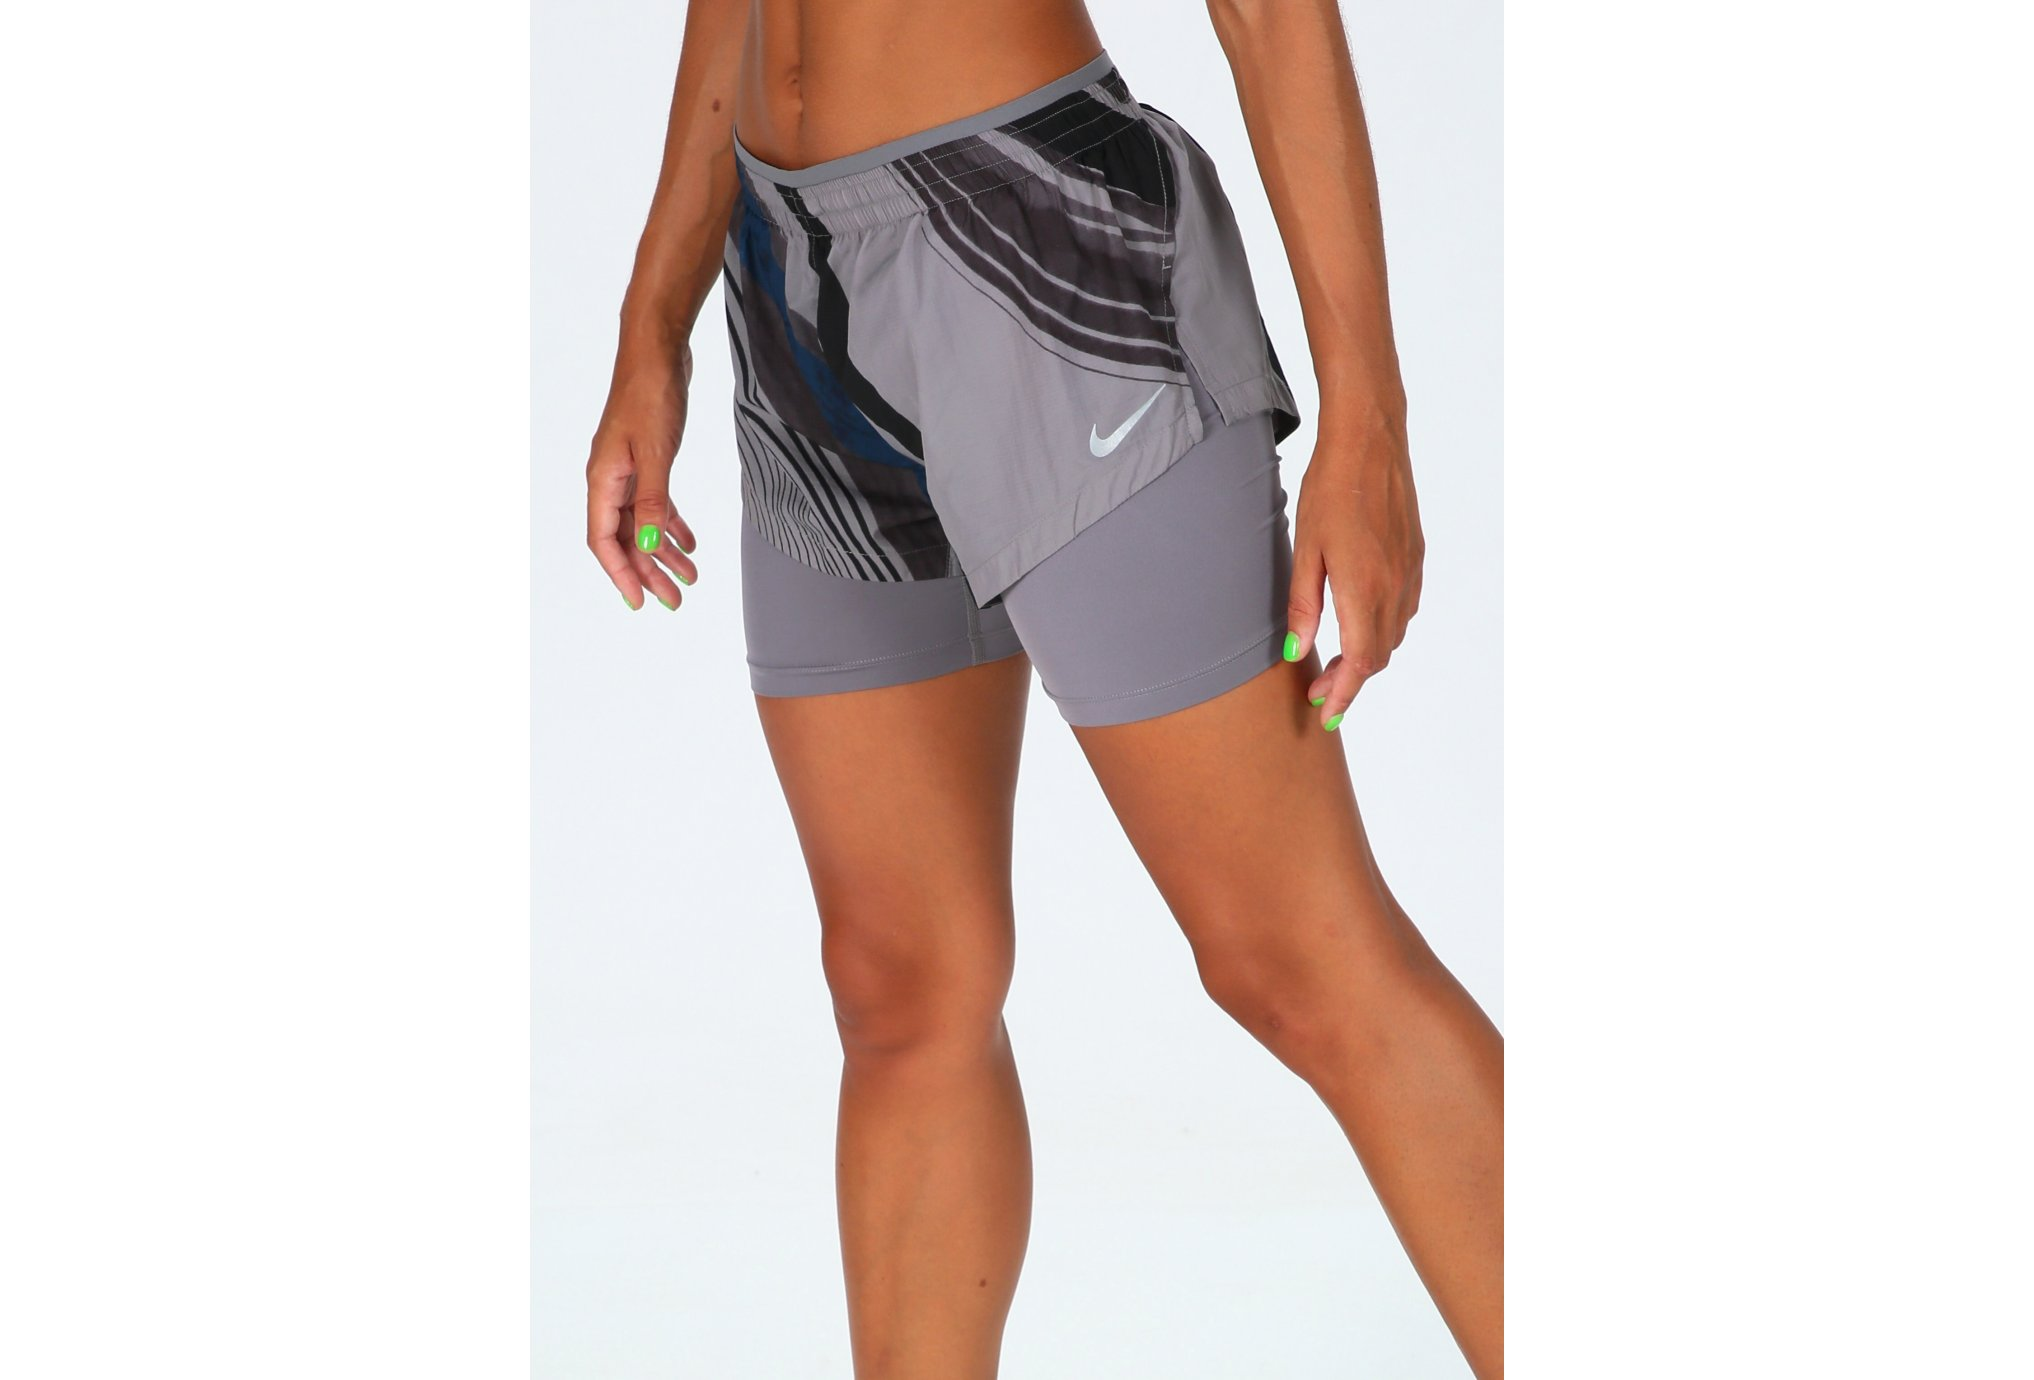 Nike Elevate Eva W vêtement running femme